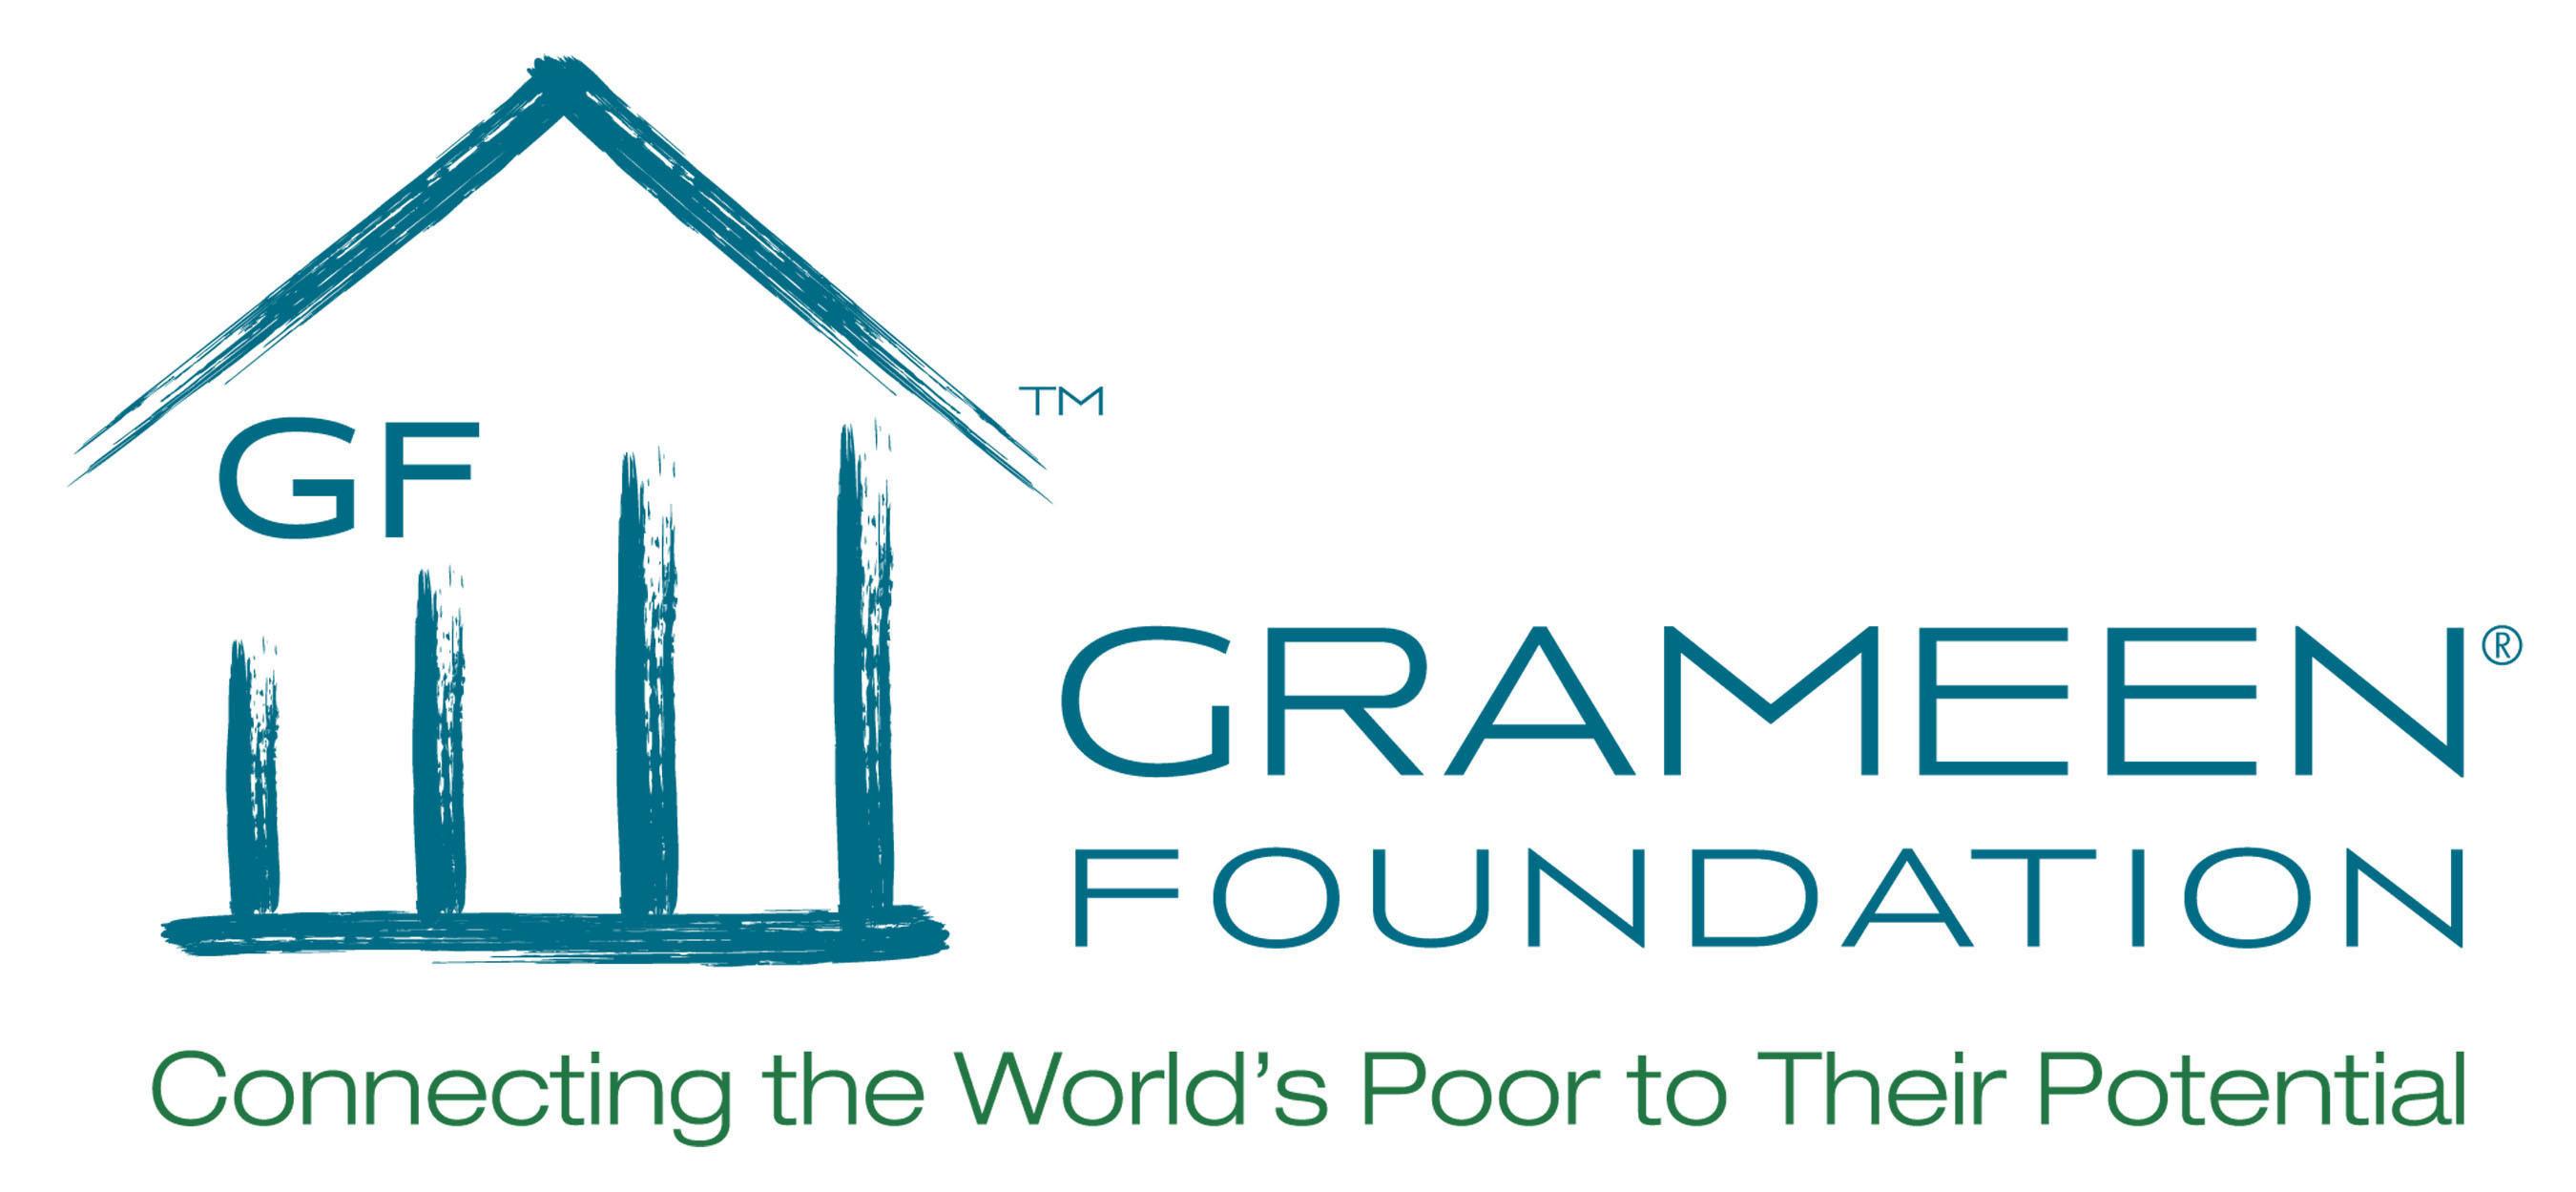 Grameen Foundation logo.